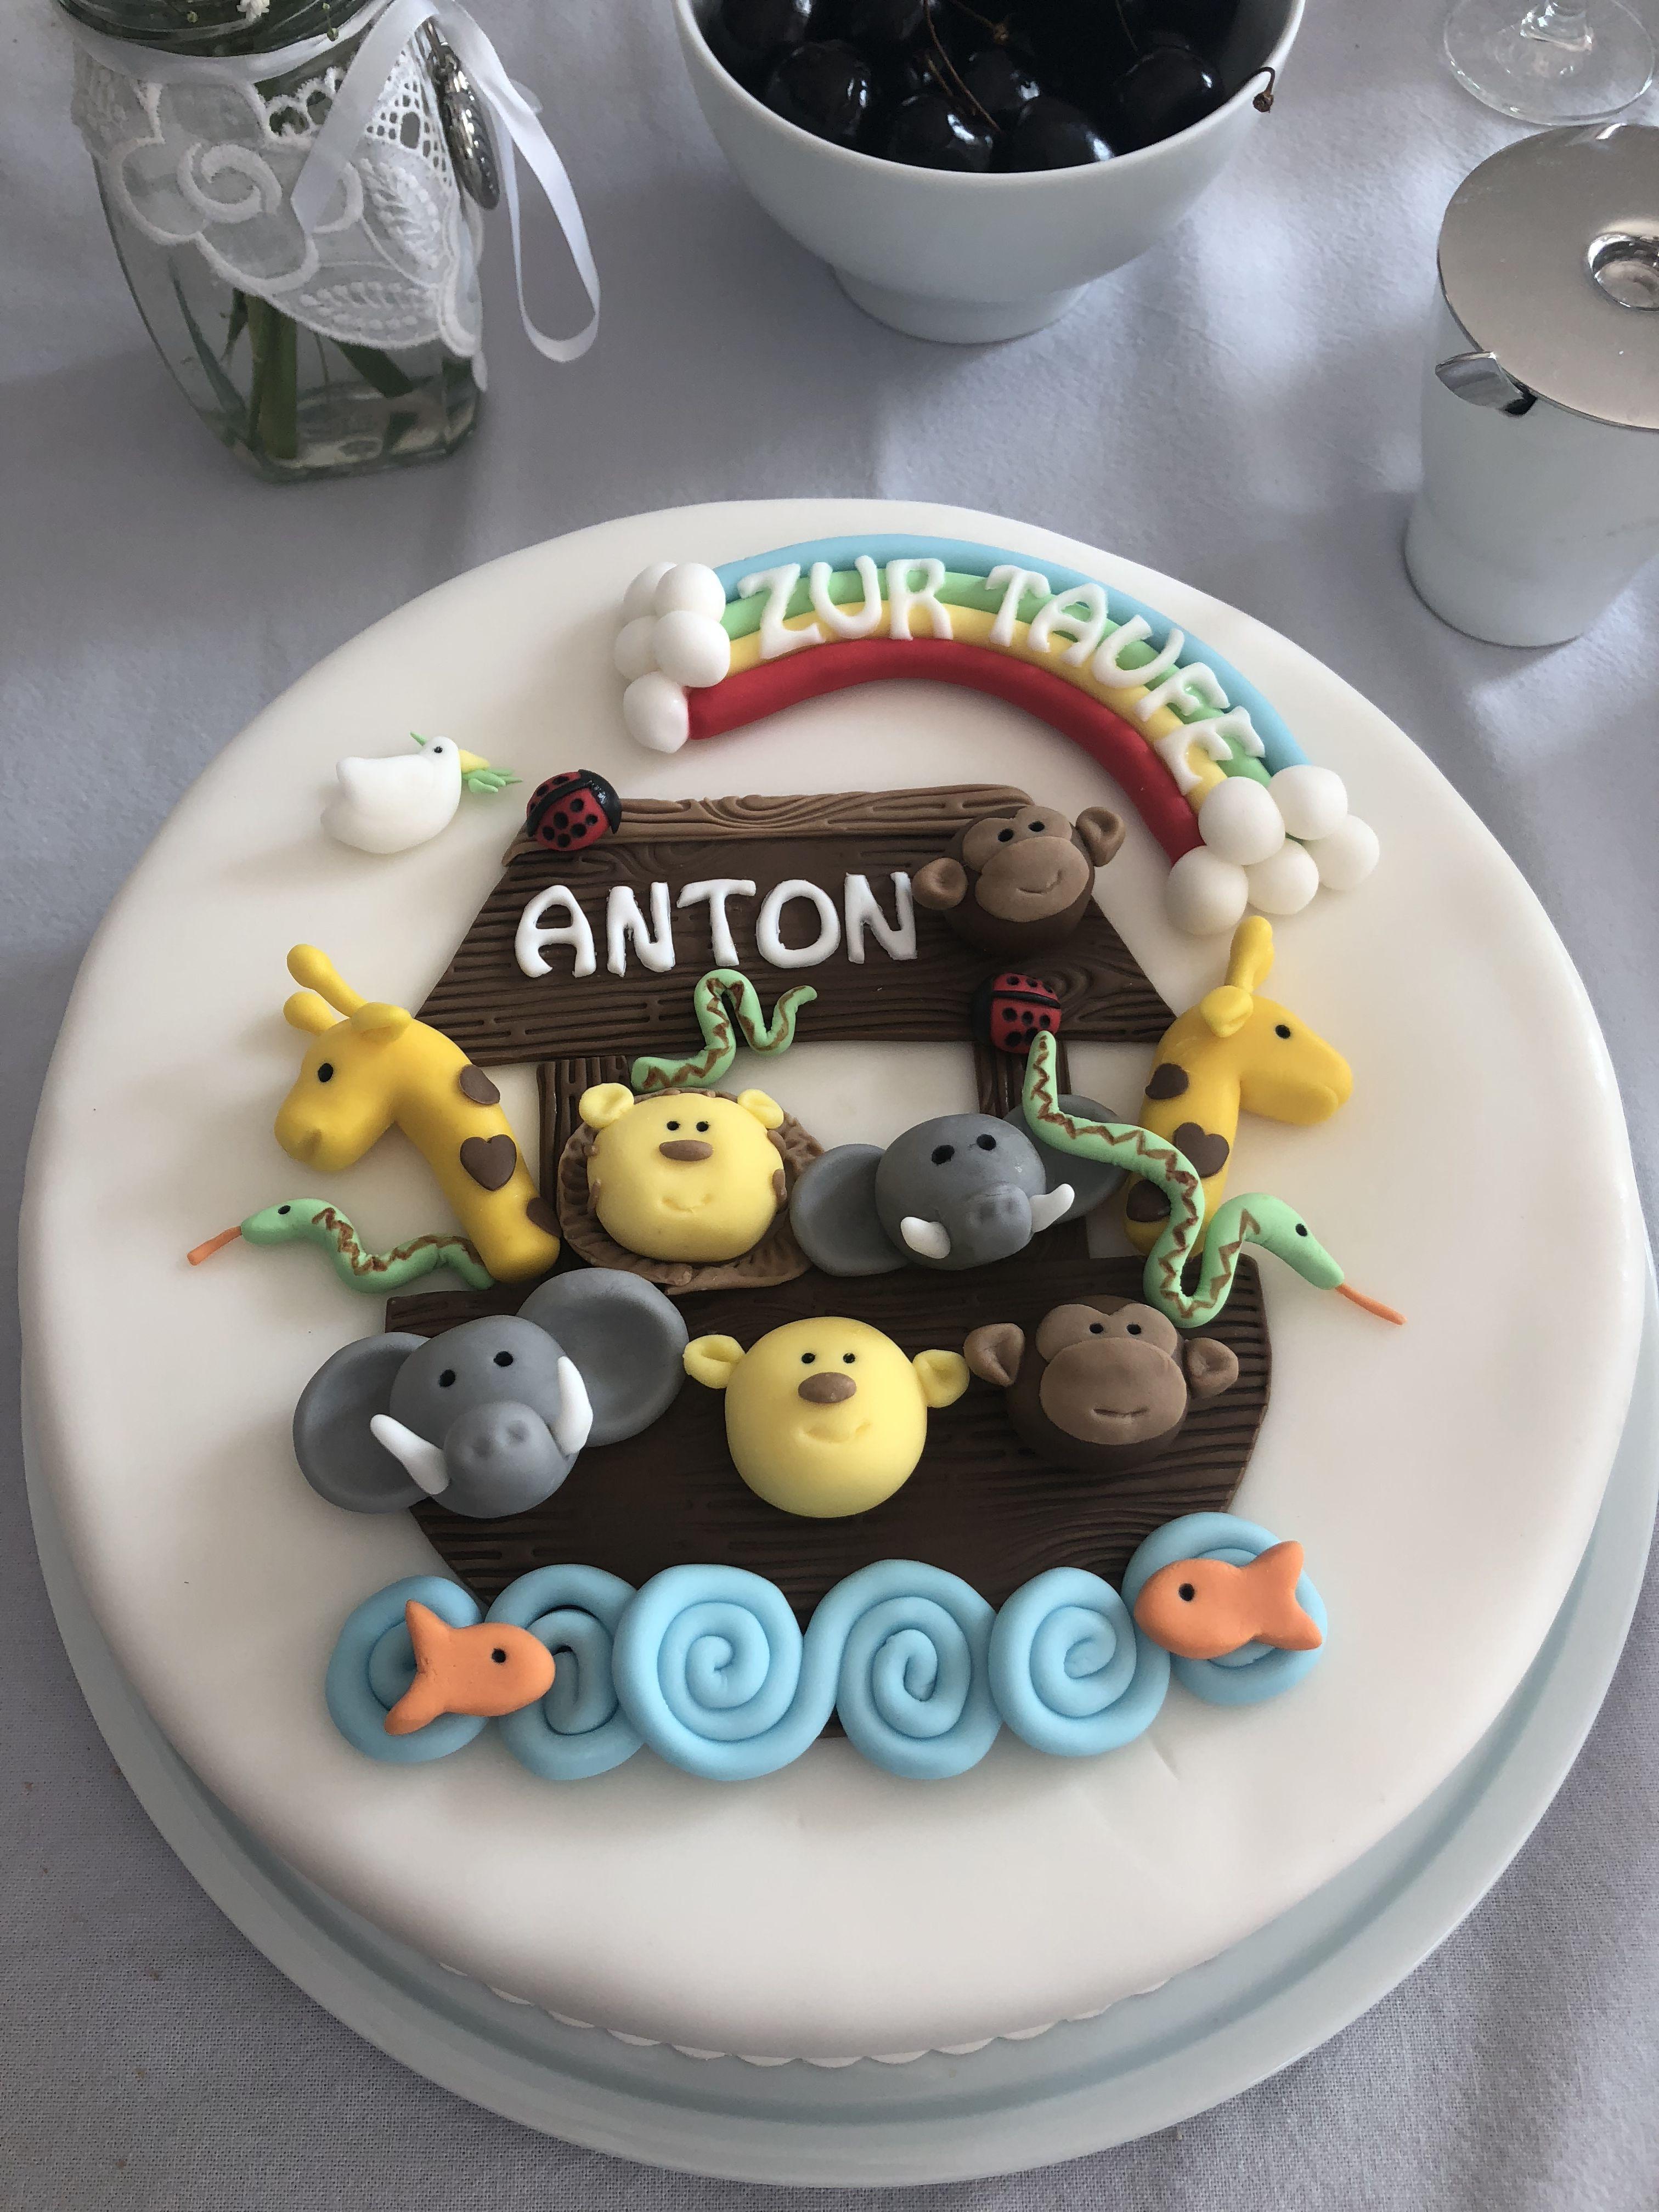 Pin Von Maritza Murillo Auf Kakes Taufe Kuchen Tortendeko